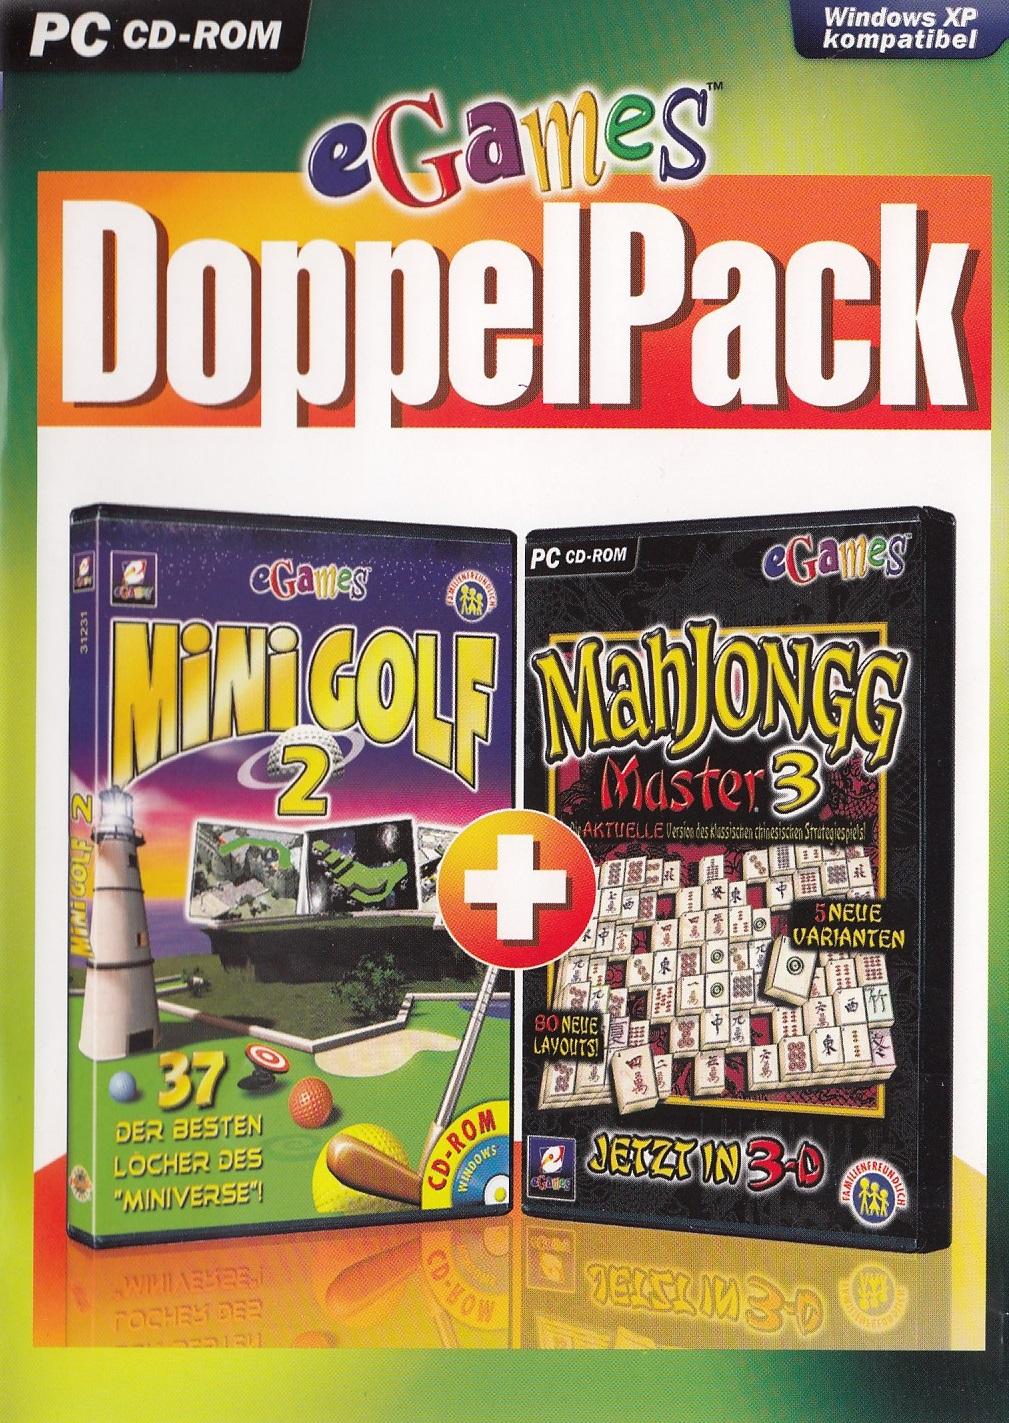 eGames Doppel Pack: Minigolf 2 / Mahjongg Master 3